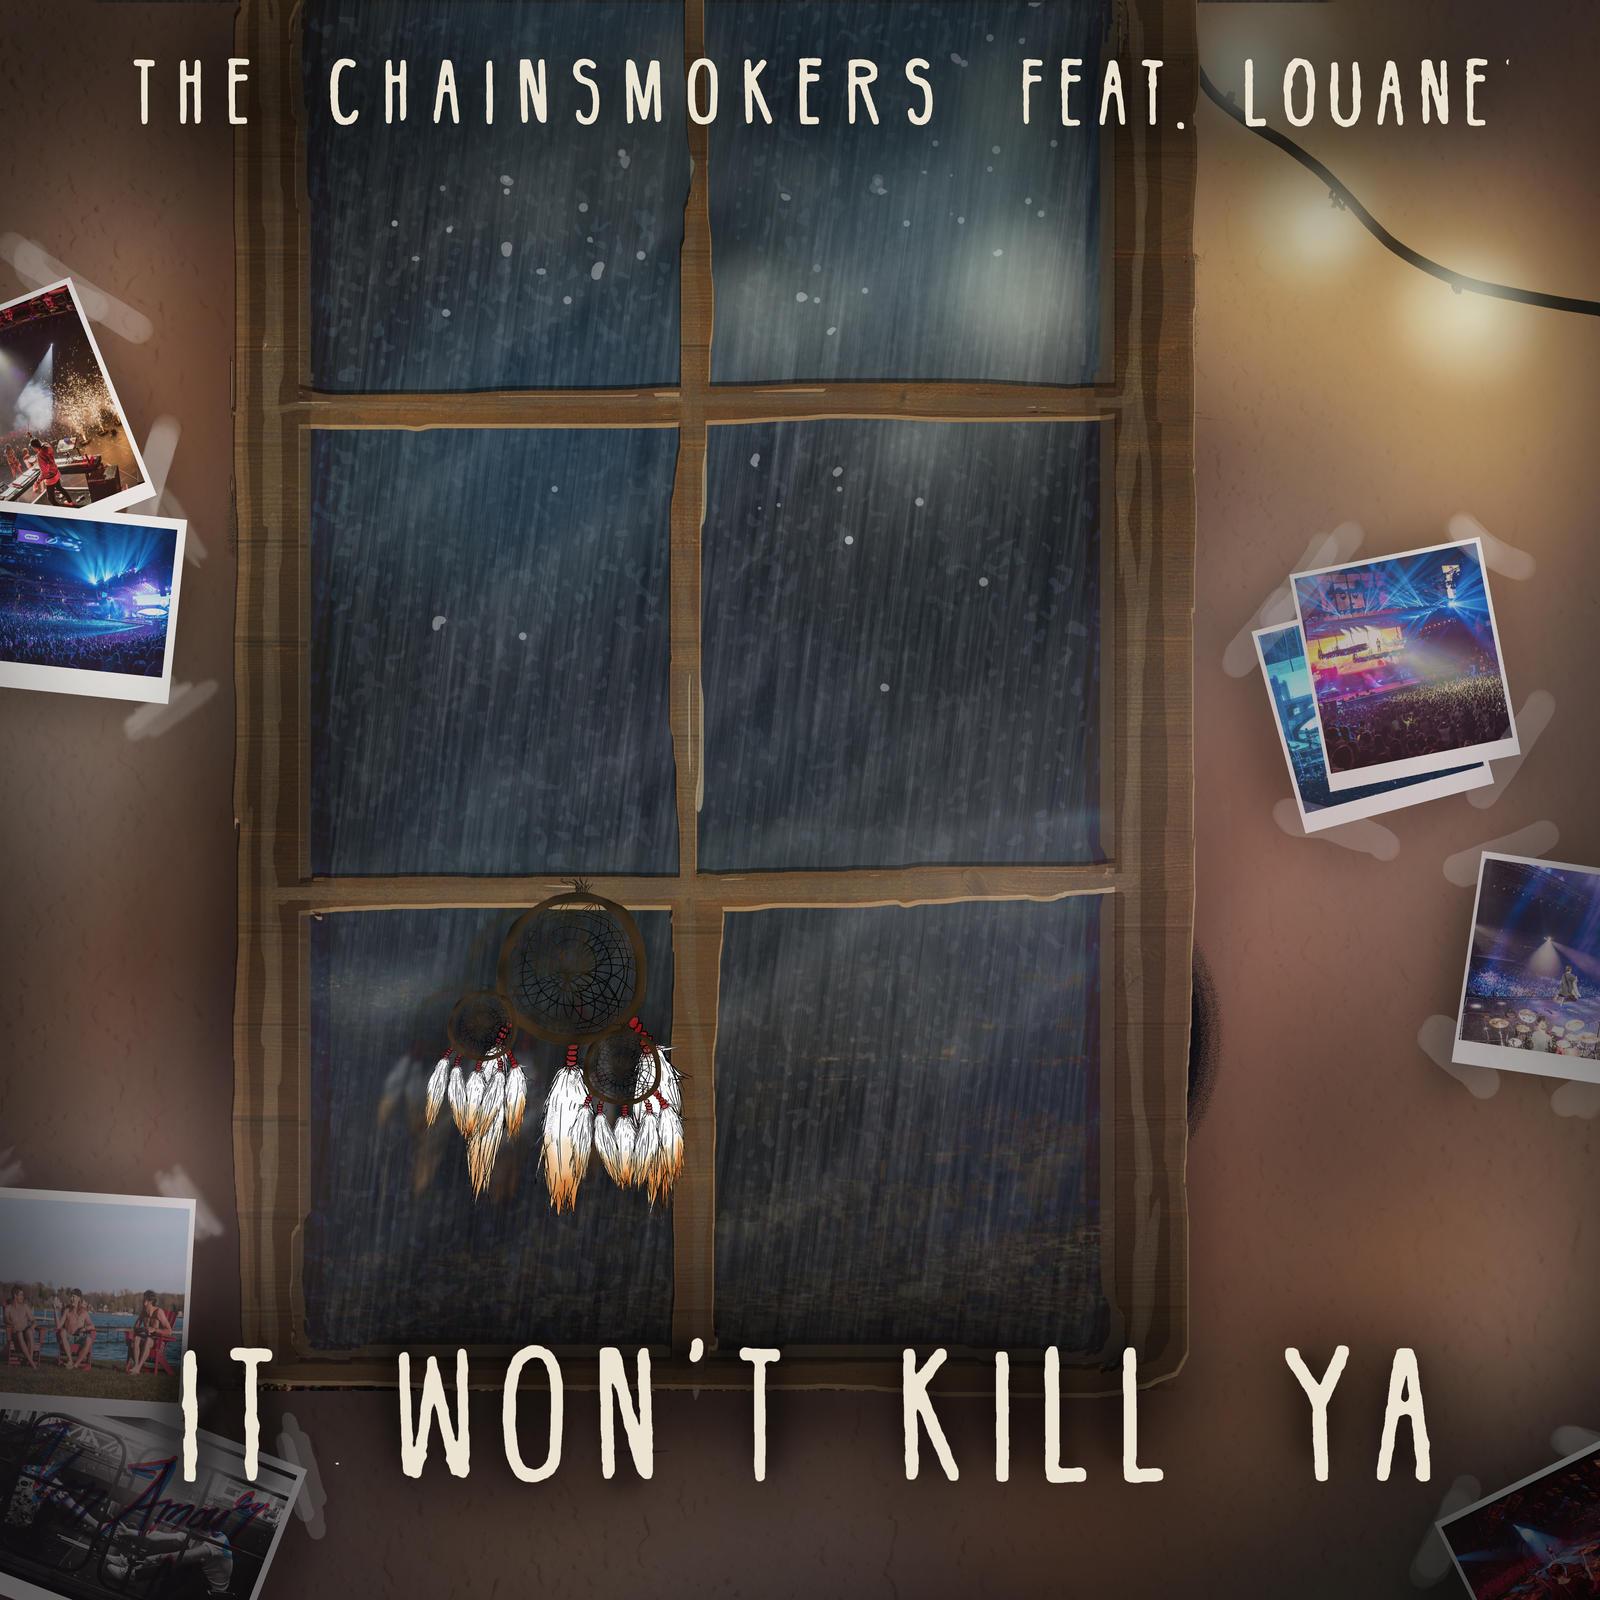 The Chainsmokers and Louane - It Won't Kill Ya (1) by joshuacarlbaradas